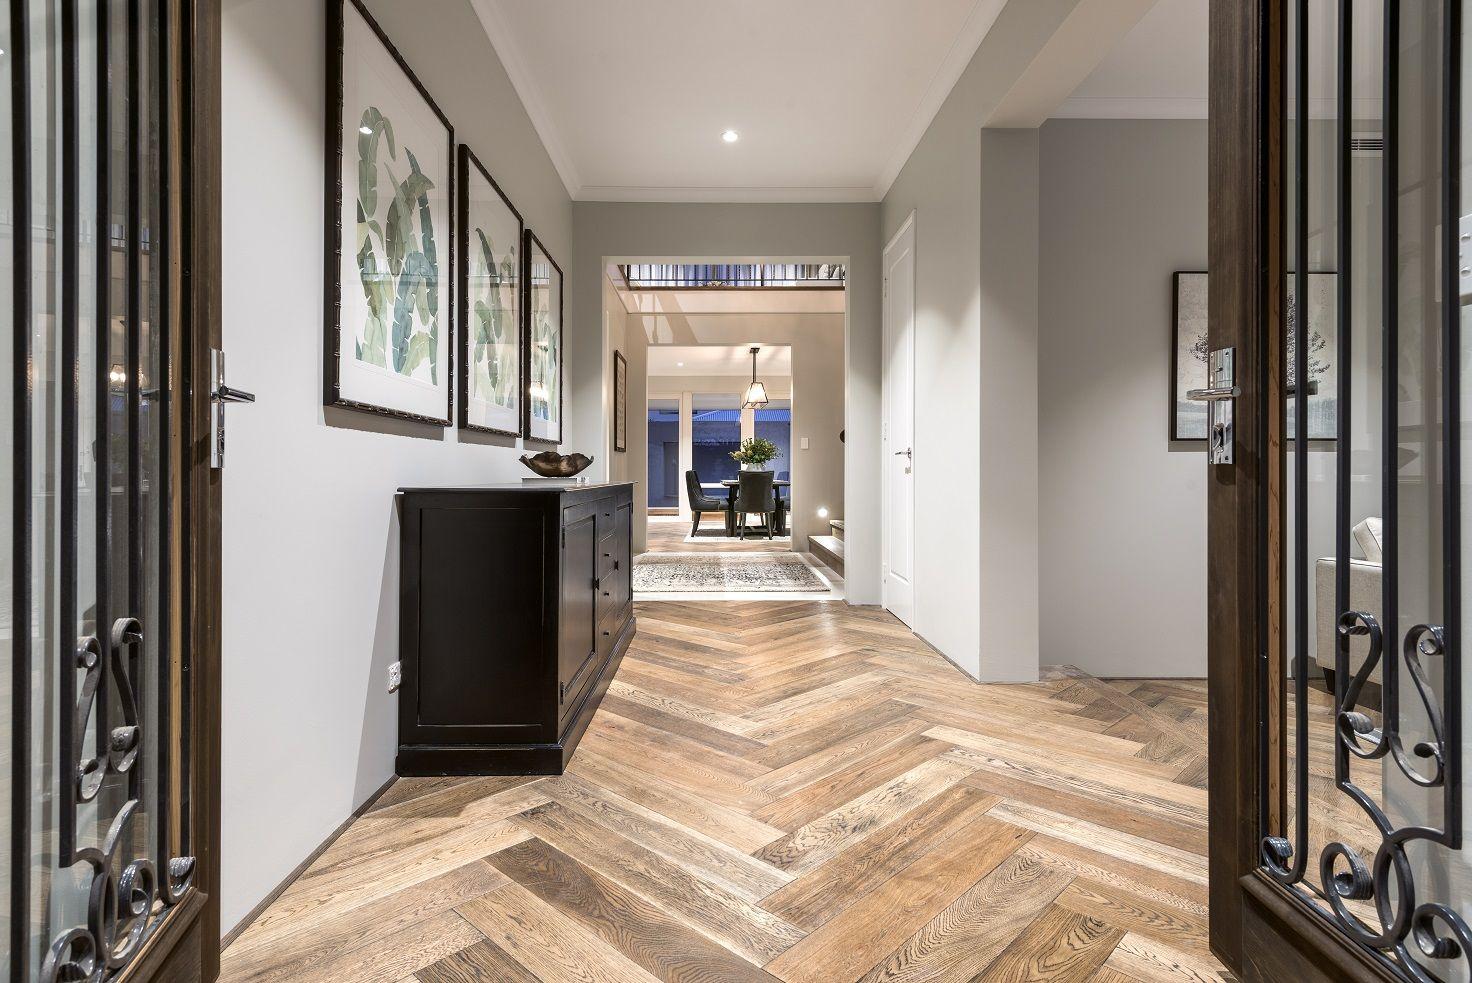 Entry To The Toorak Display Home By Webb & Brown-Neaves